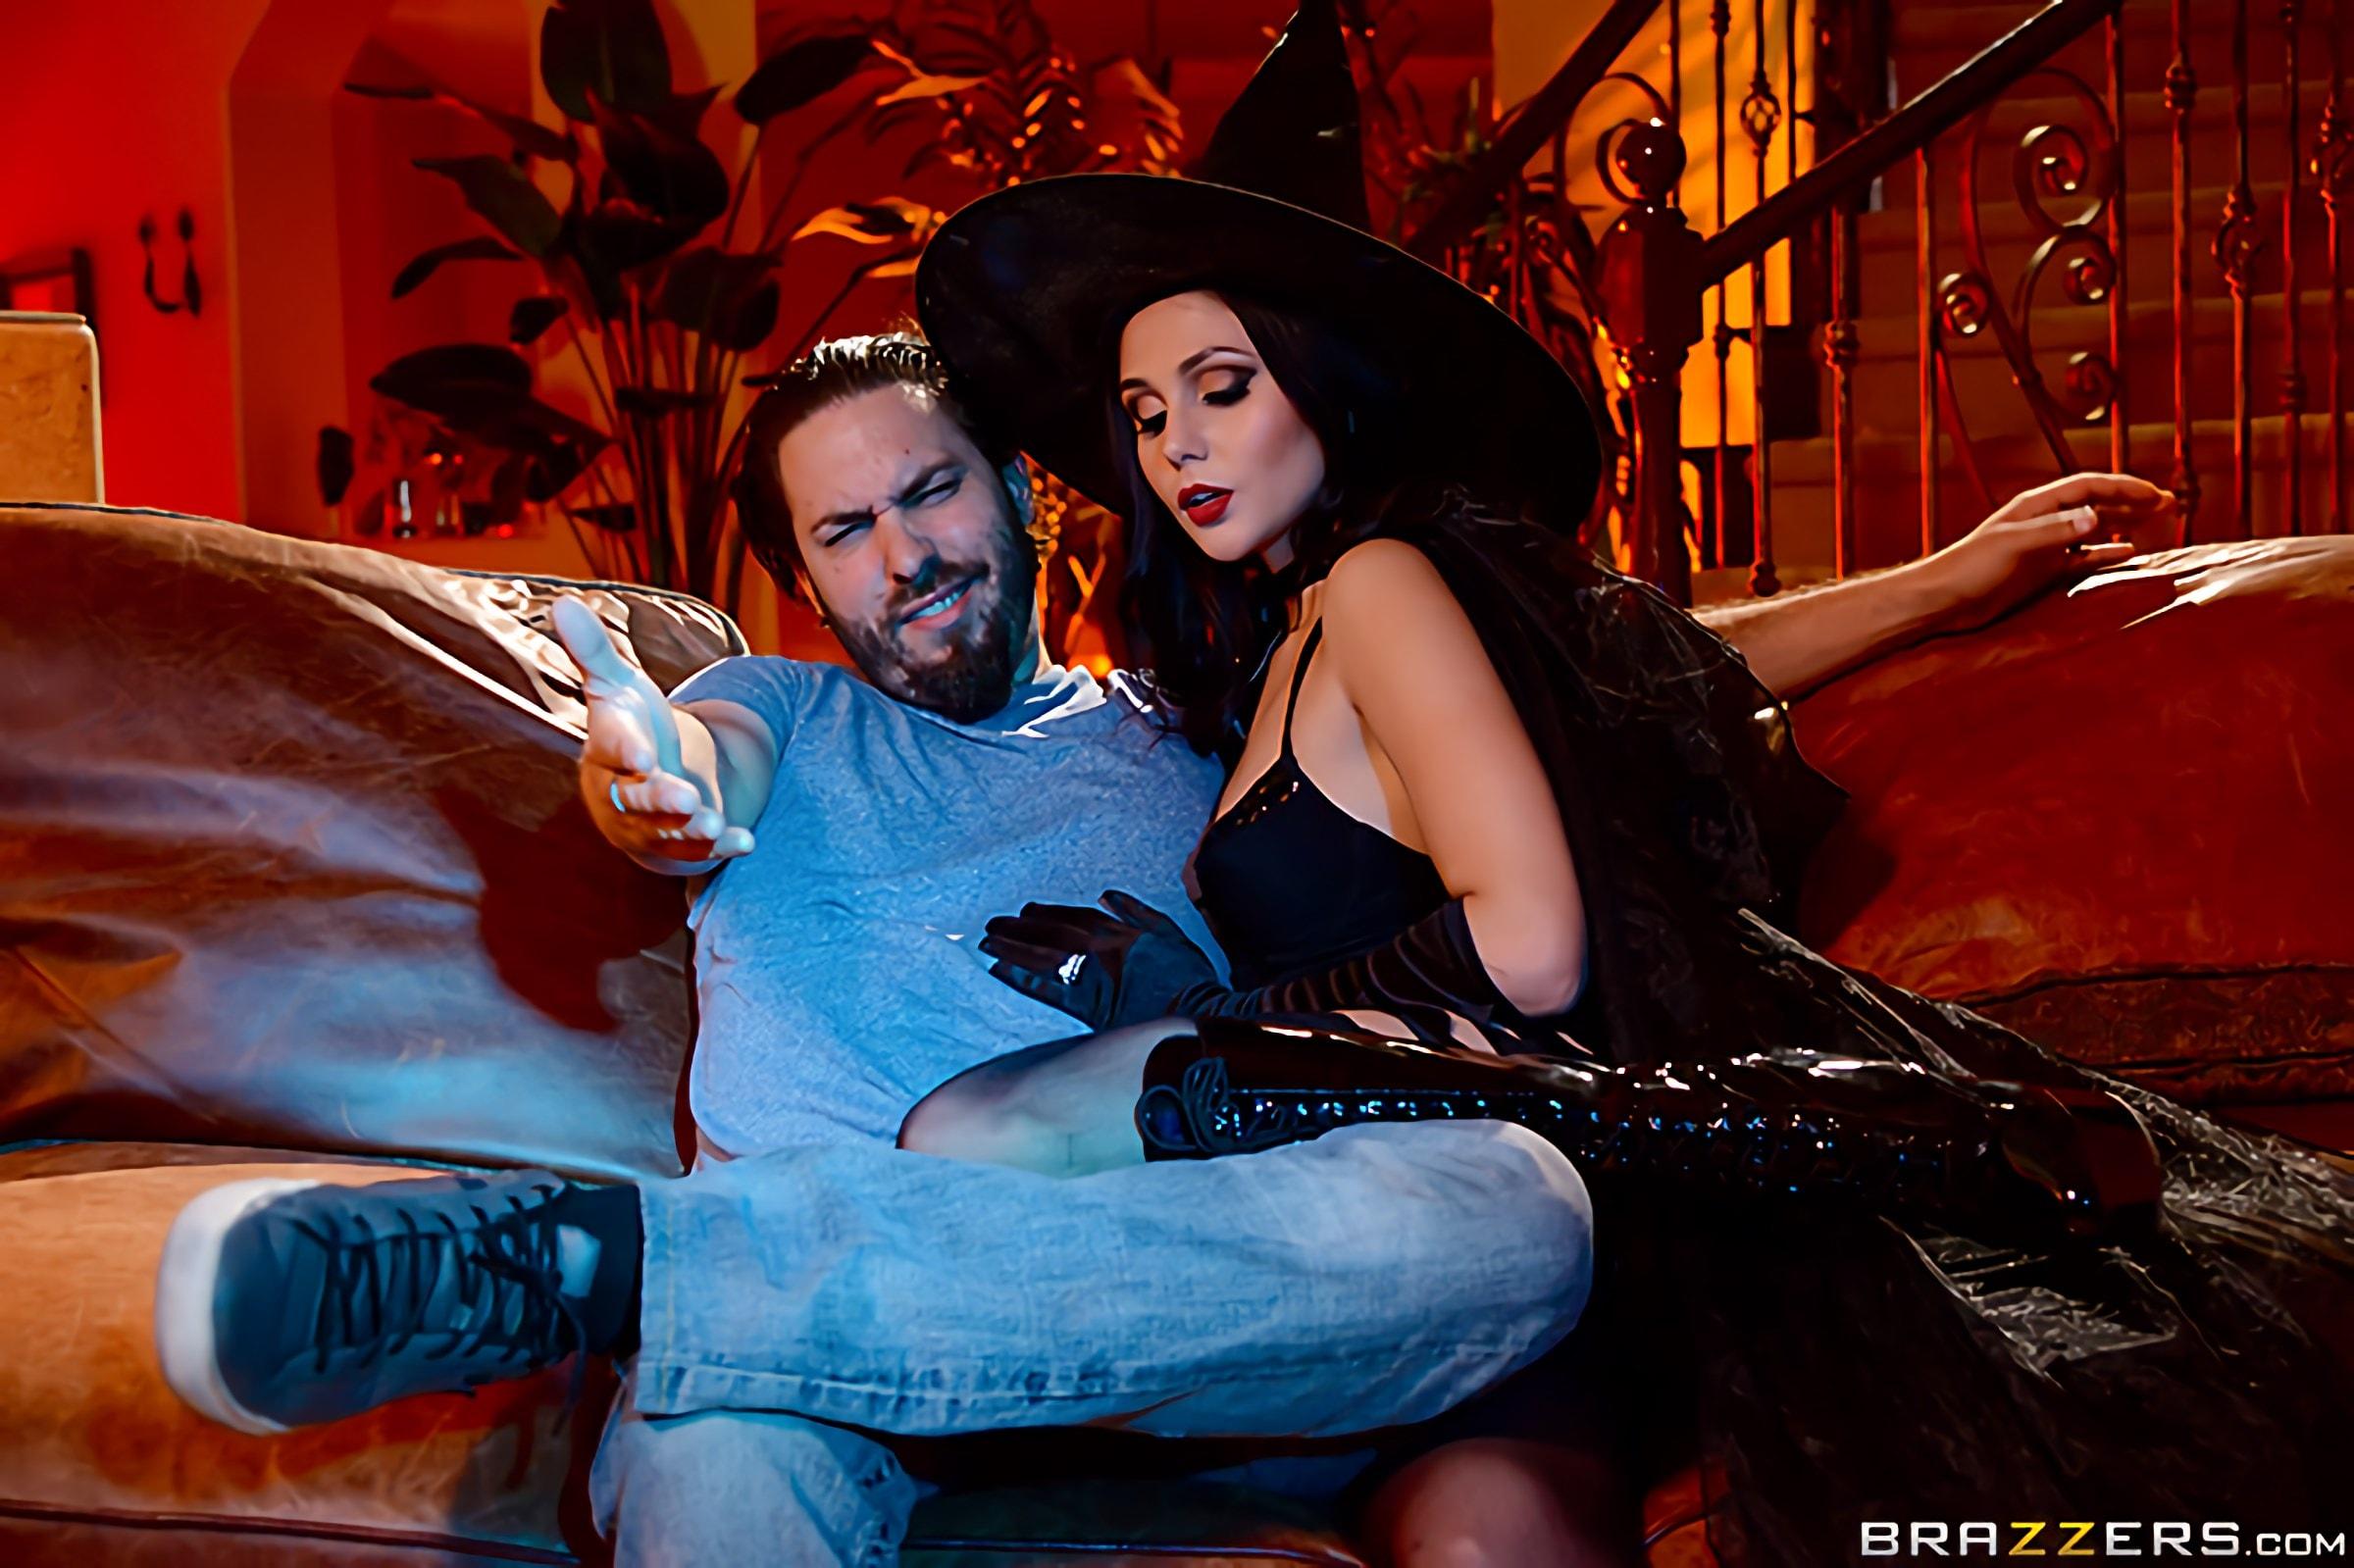 Brazzers 'Dick Or Treat' starring Ariana Marie (Photo 11)